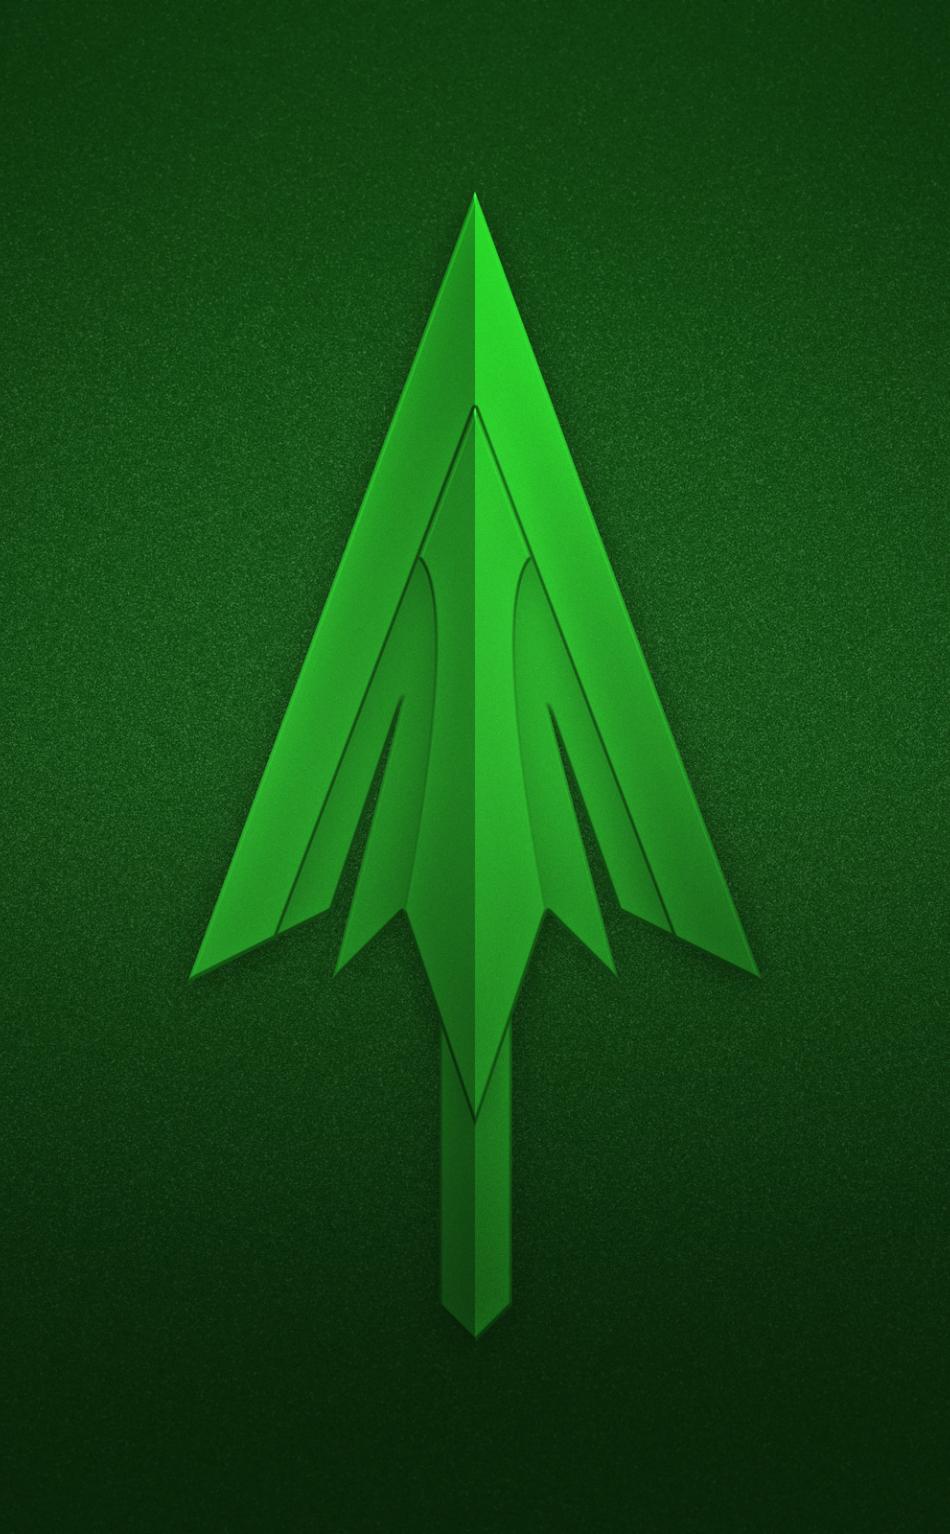 Download 950x1534 Wallpaper Green Arrow Logo Minimal Iphone